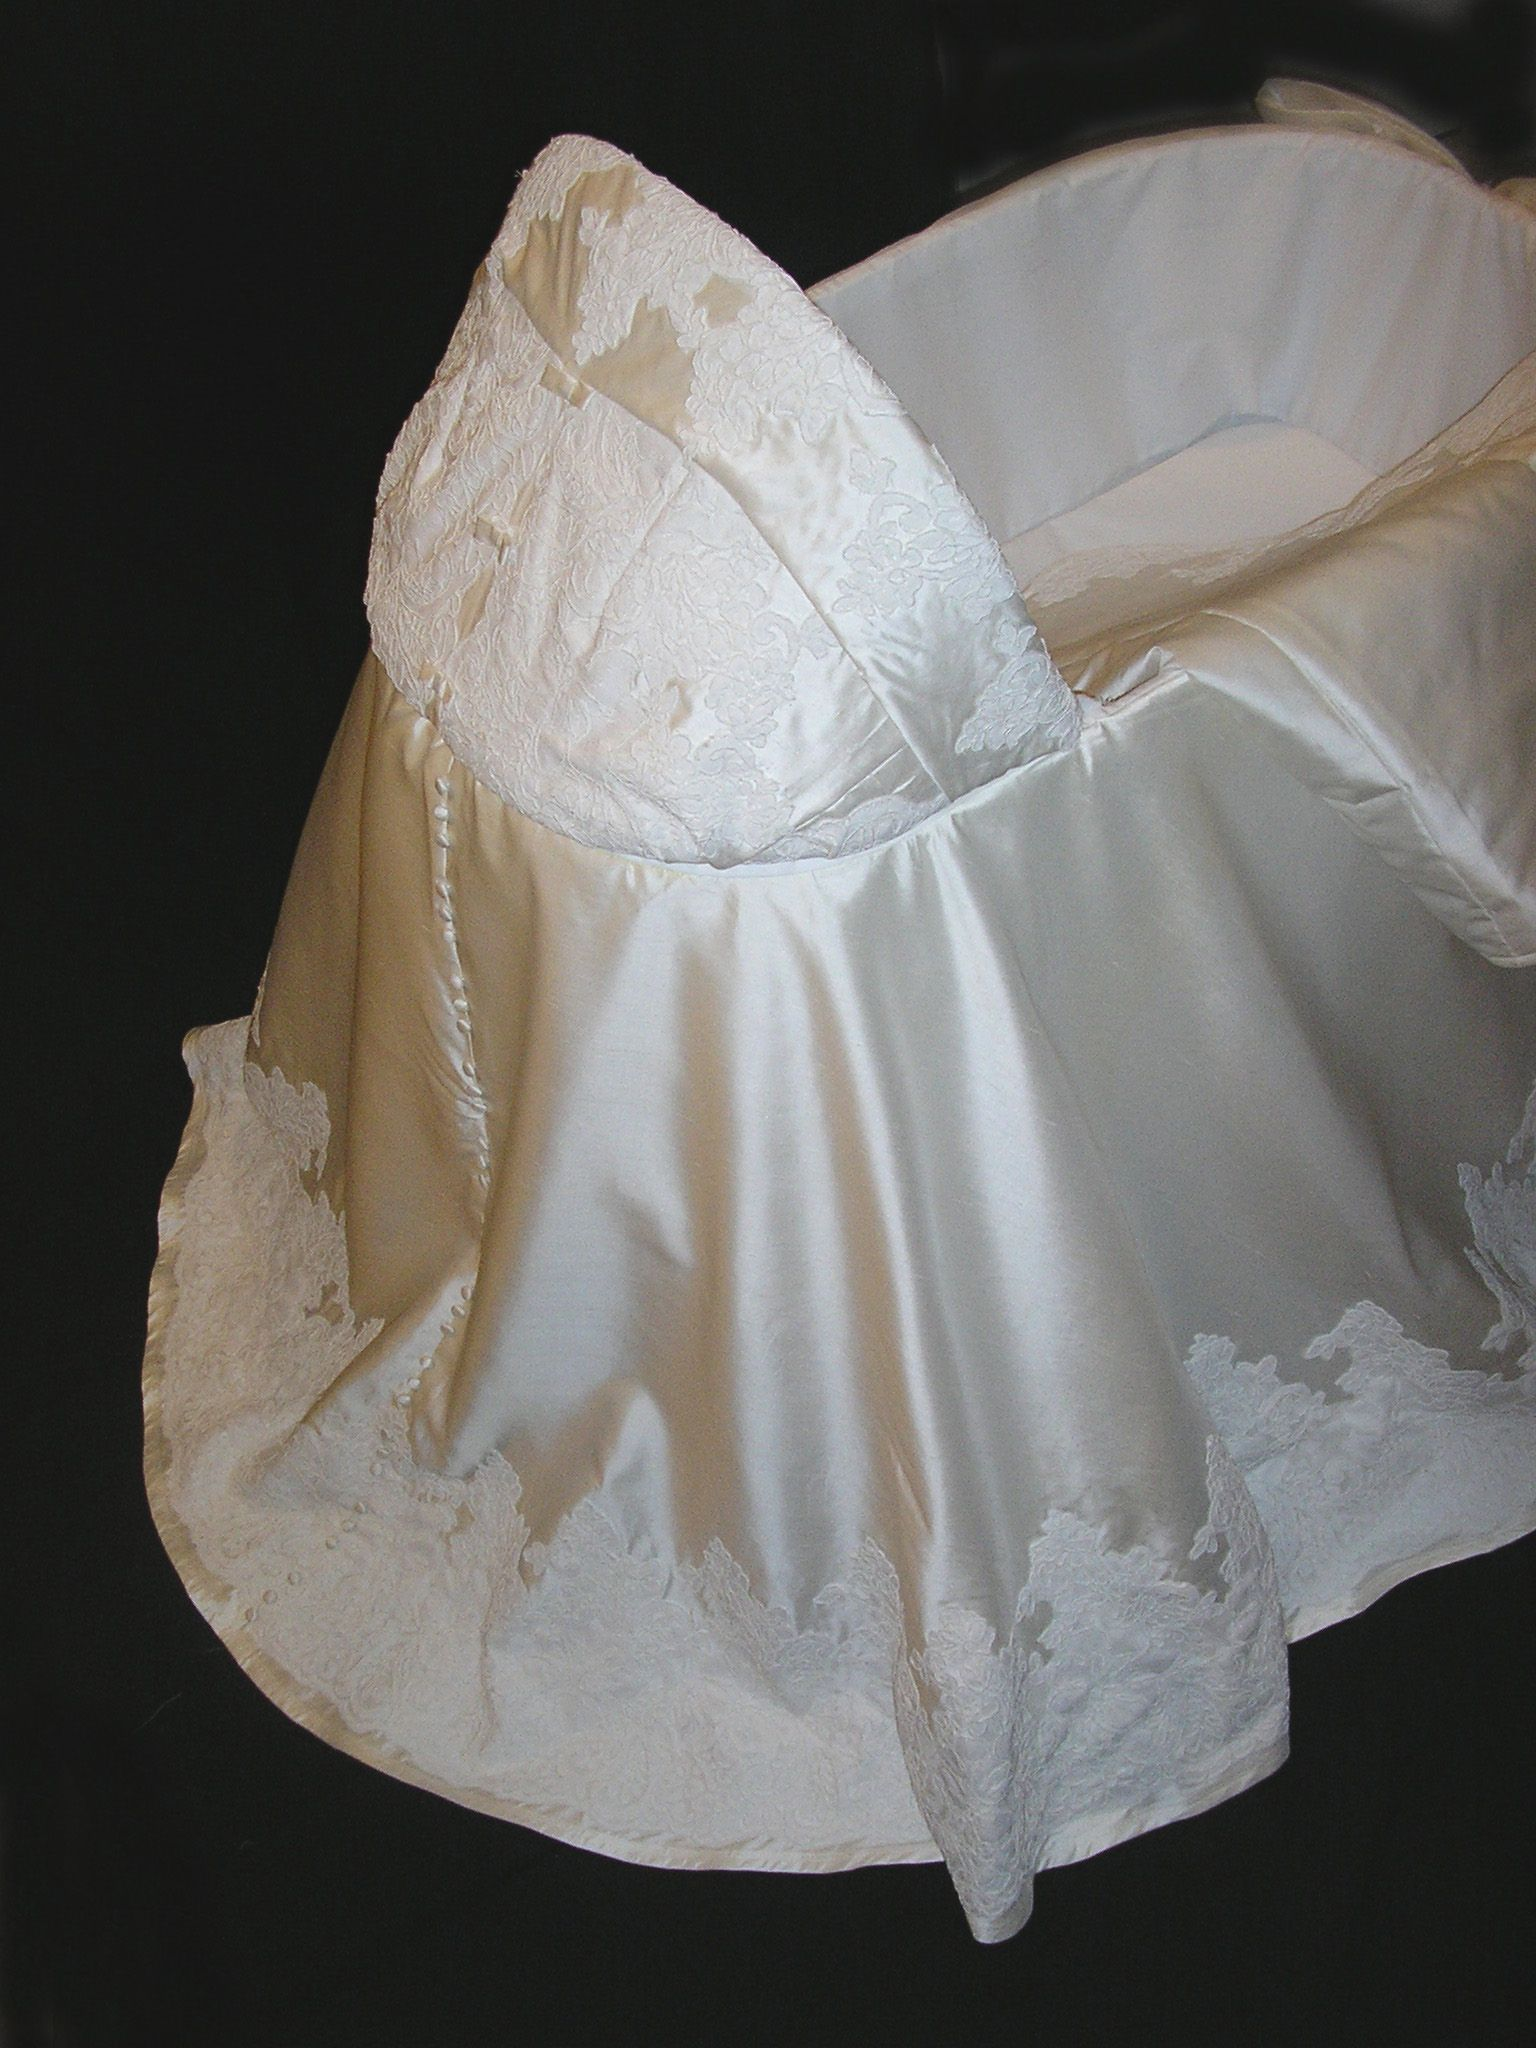 Repurpose wedding dress  Turn wedding gown into bassinet skirt  Like  Pinterest